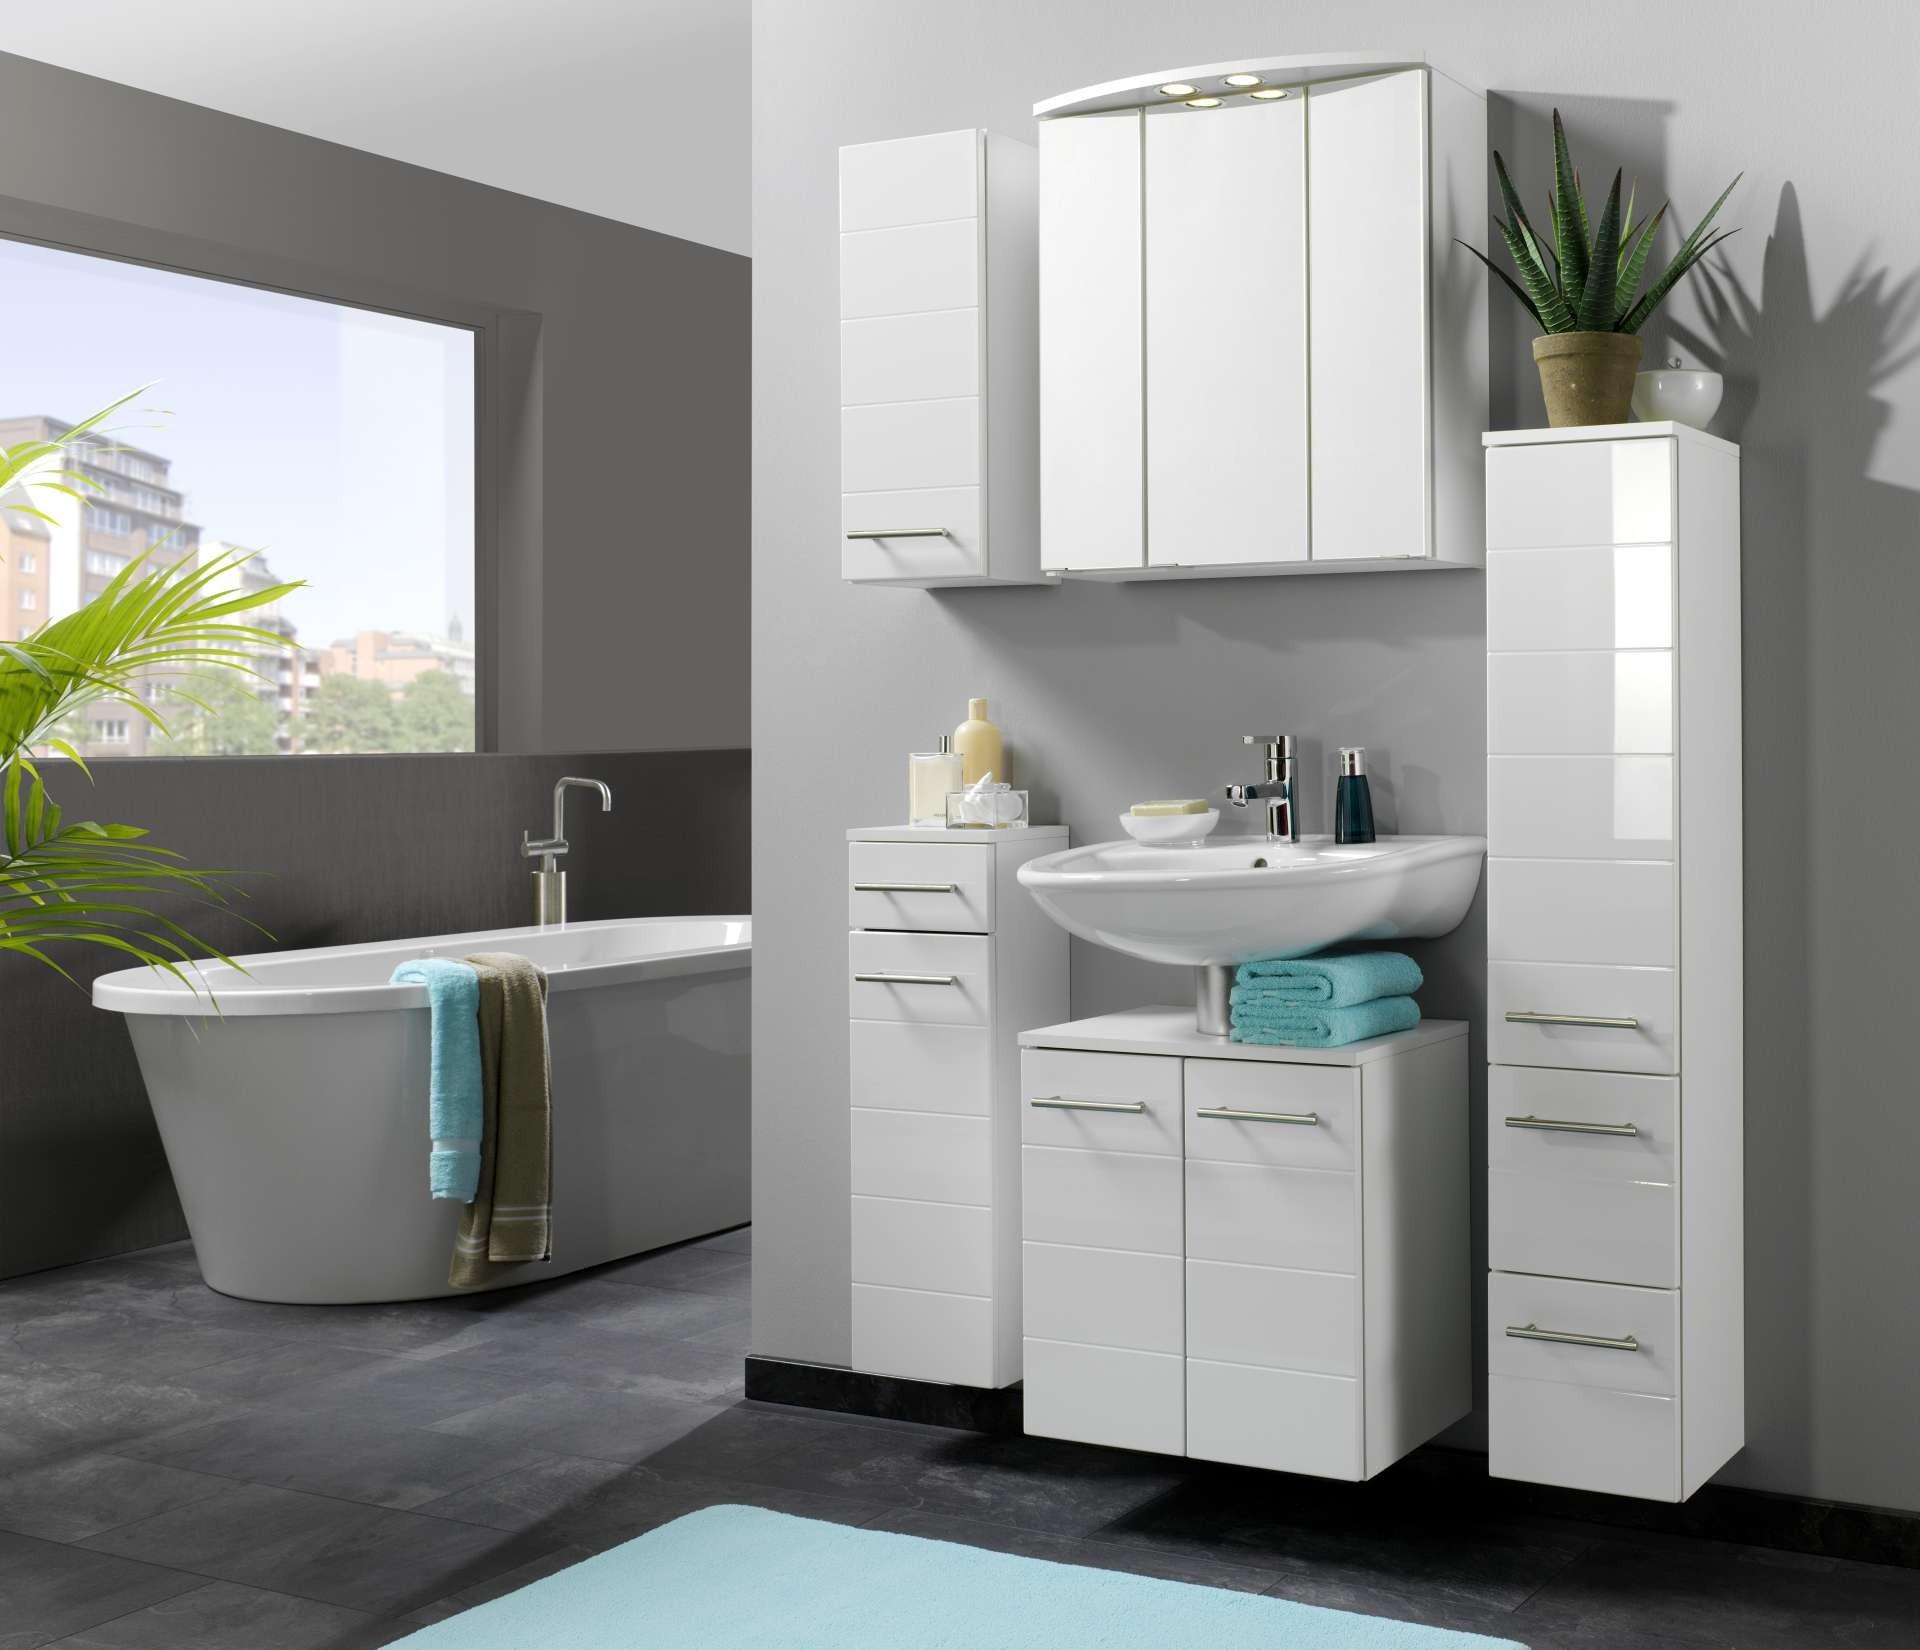 bad midischrank rimini 1 t rig 2 schubladen 25 cm breit hochglanz wei bad rimini. Black Bedroom Furniture Sets. Home Design Ideas